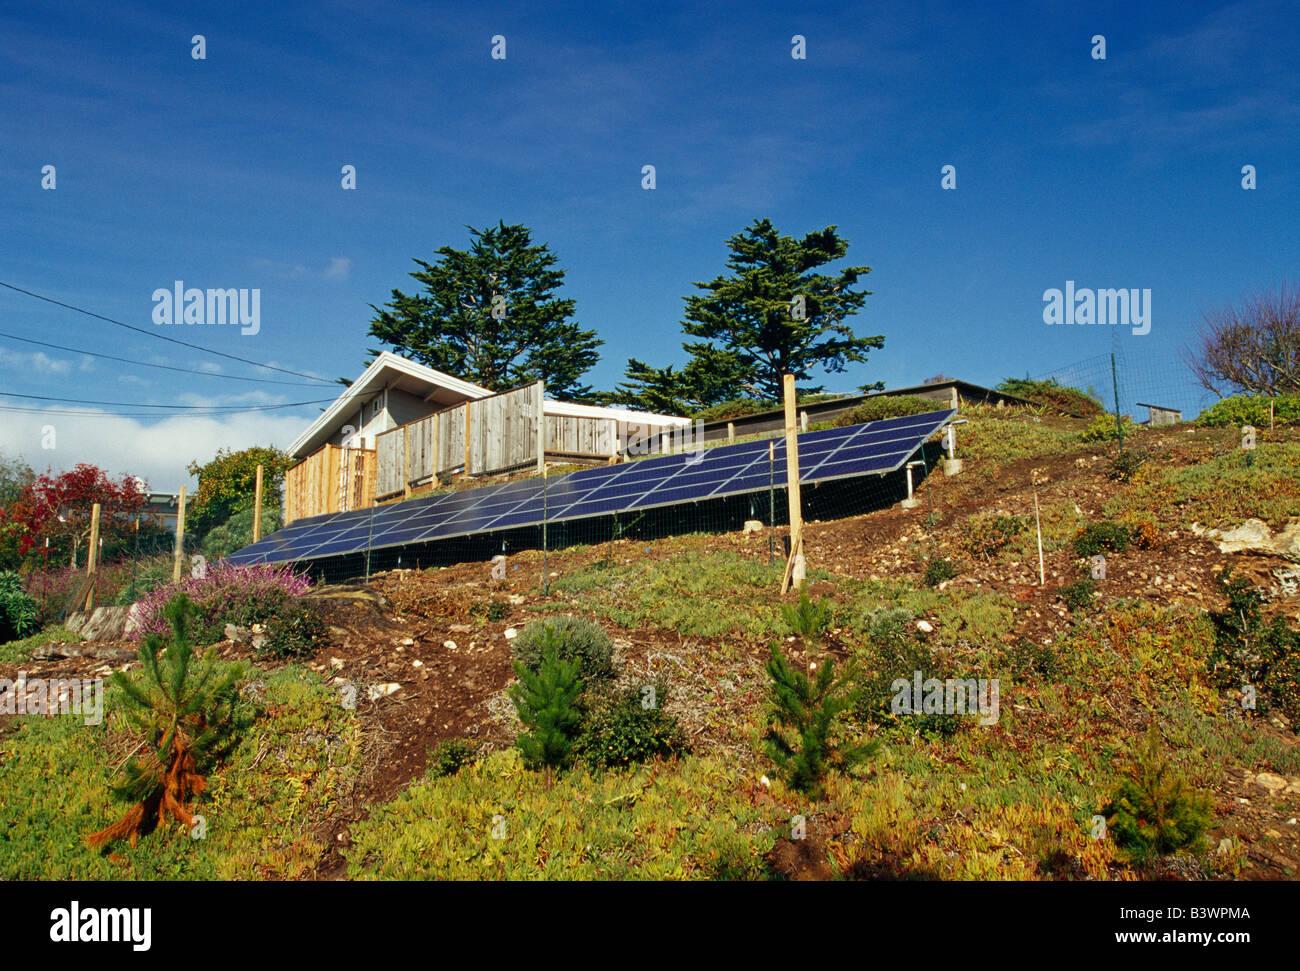 Solar panels operating at residence. - Stock Image